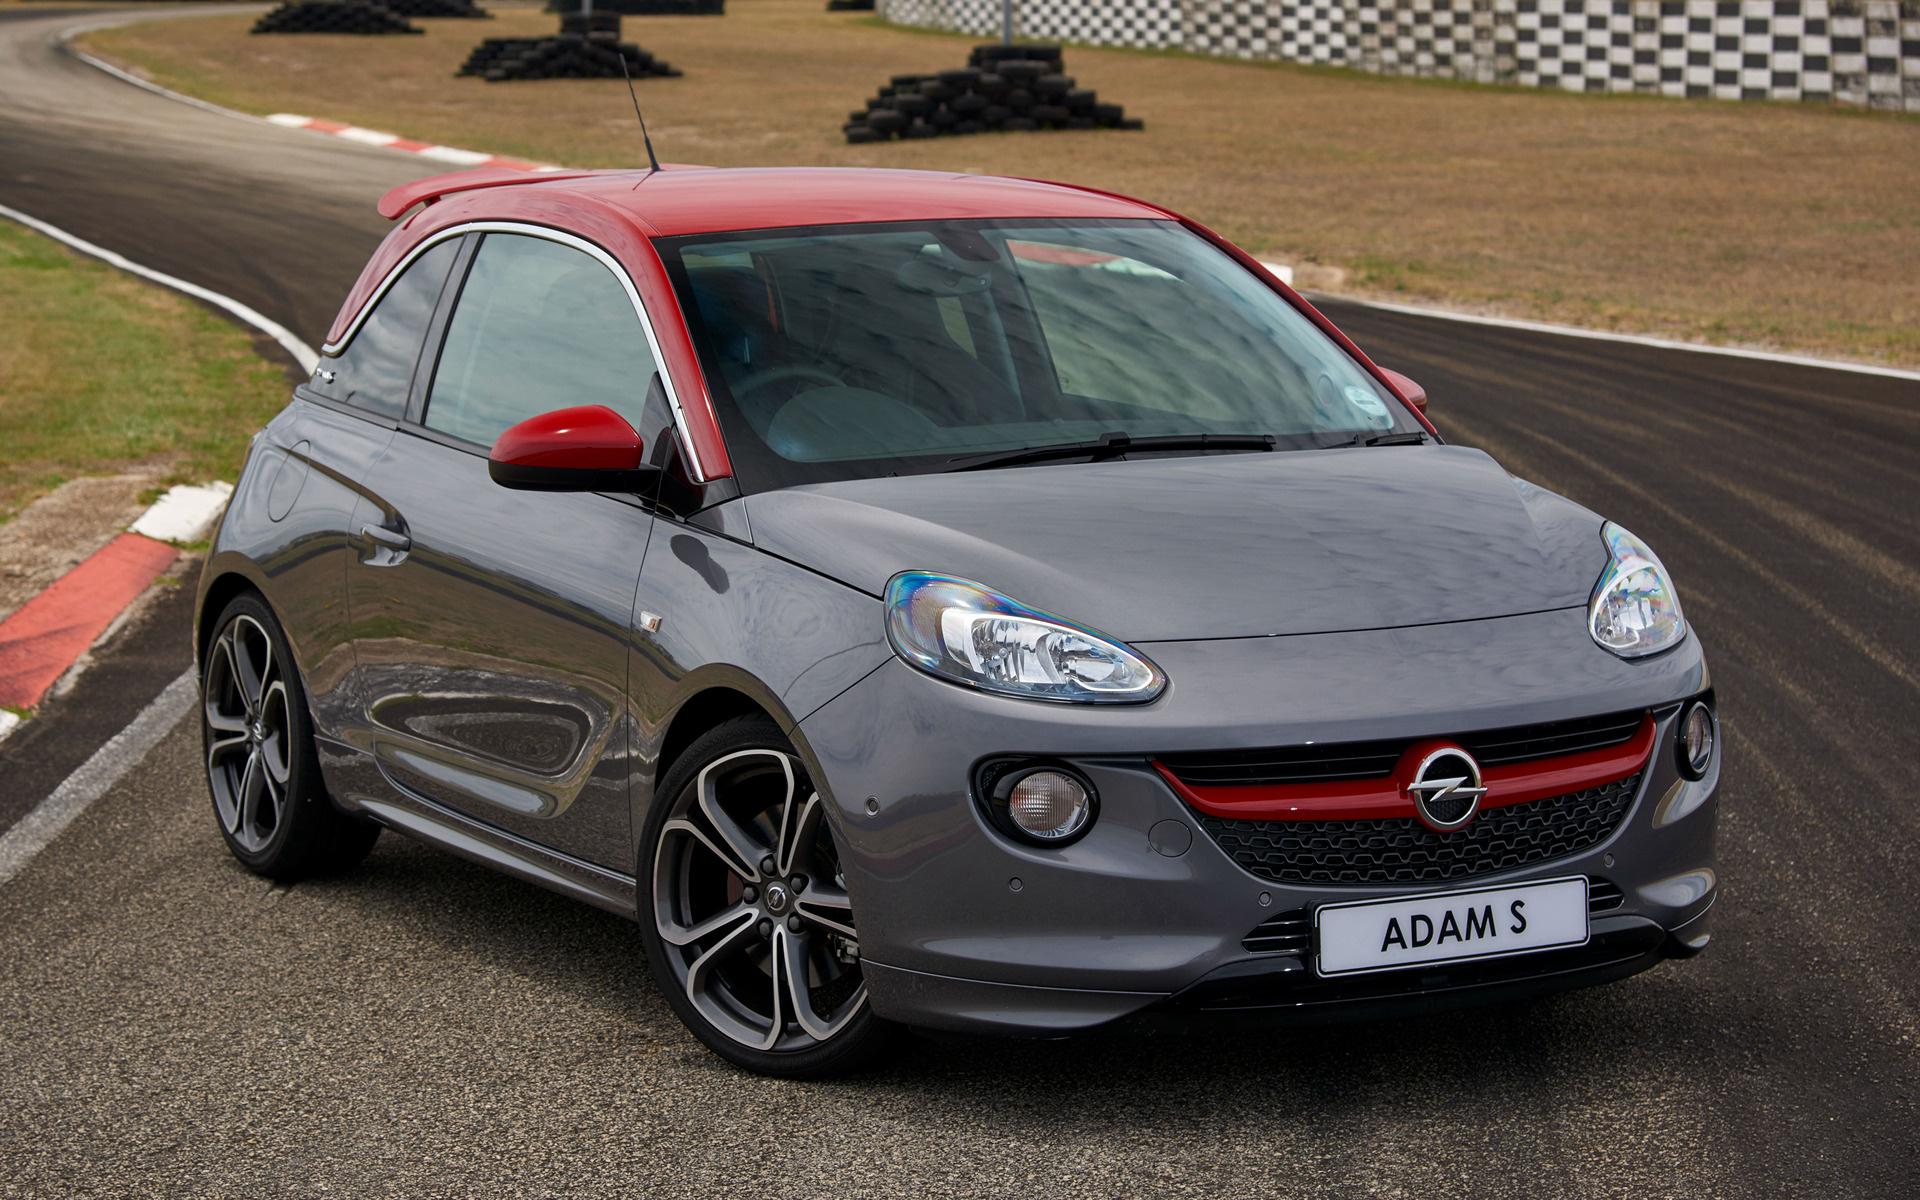 Opel Adam S Car Wallpaper